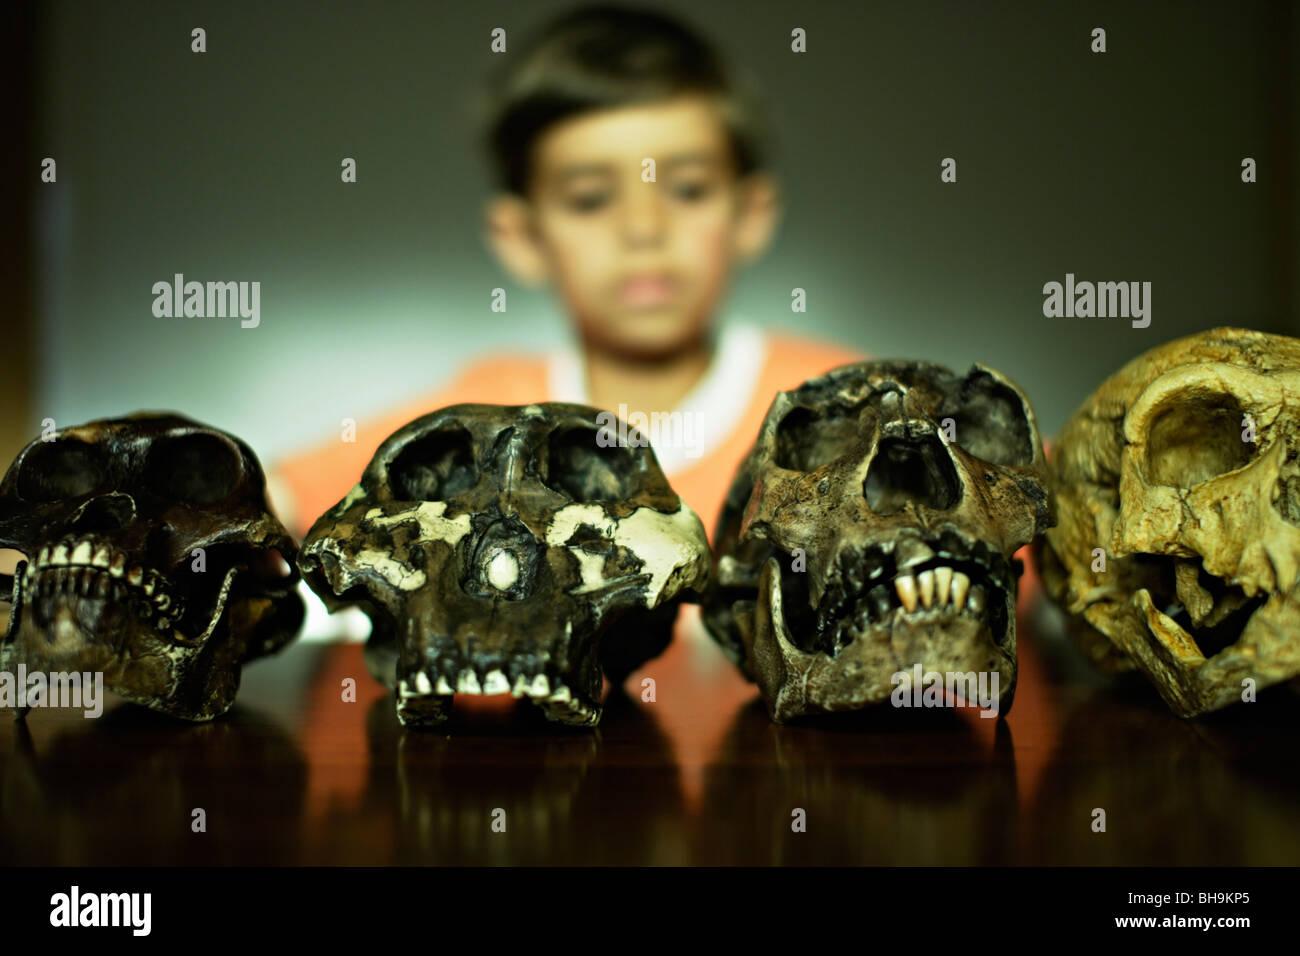 Boy looks at reproduction skulls of extinct human ancestors - Stock Image